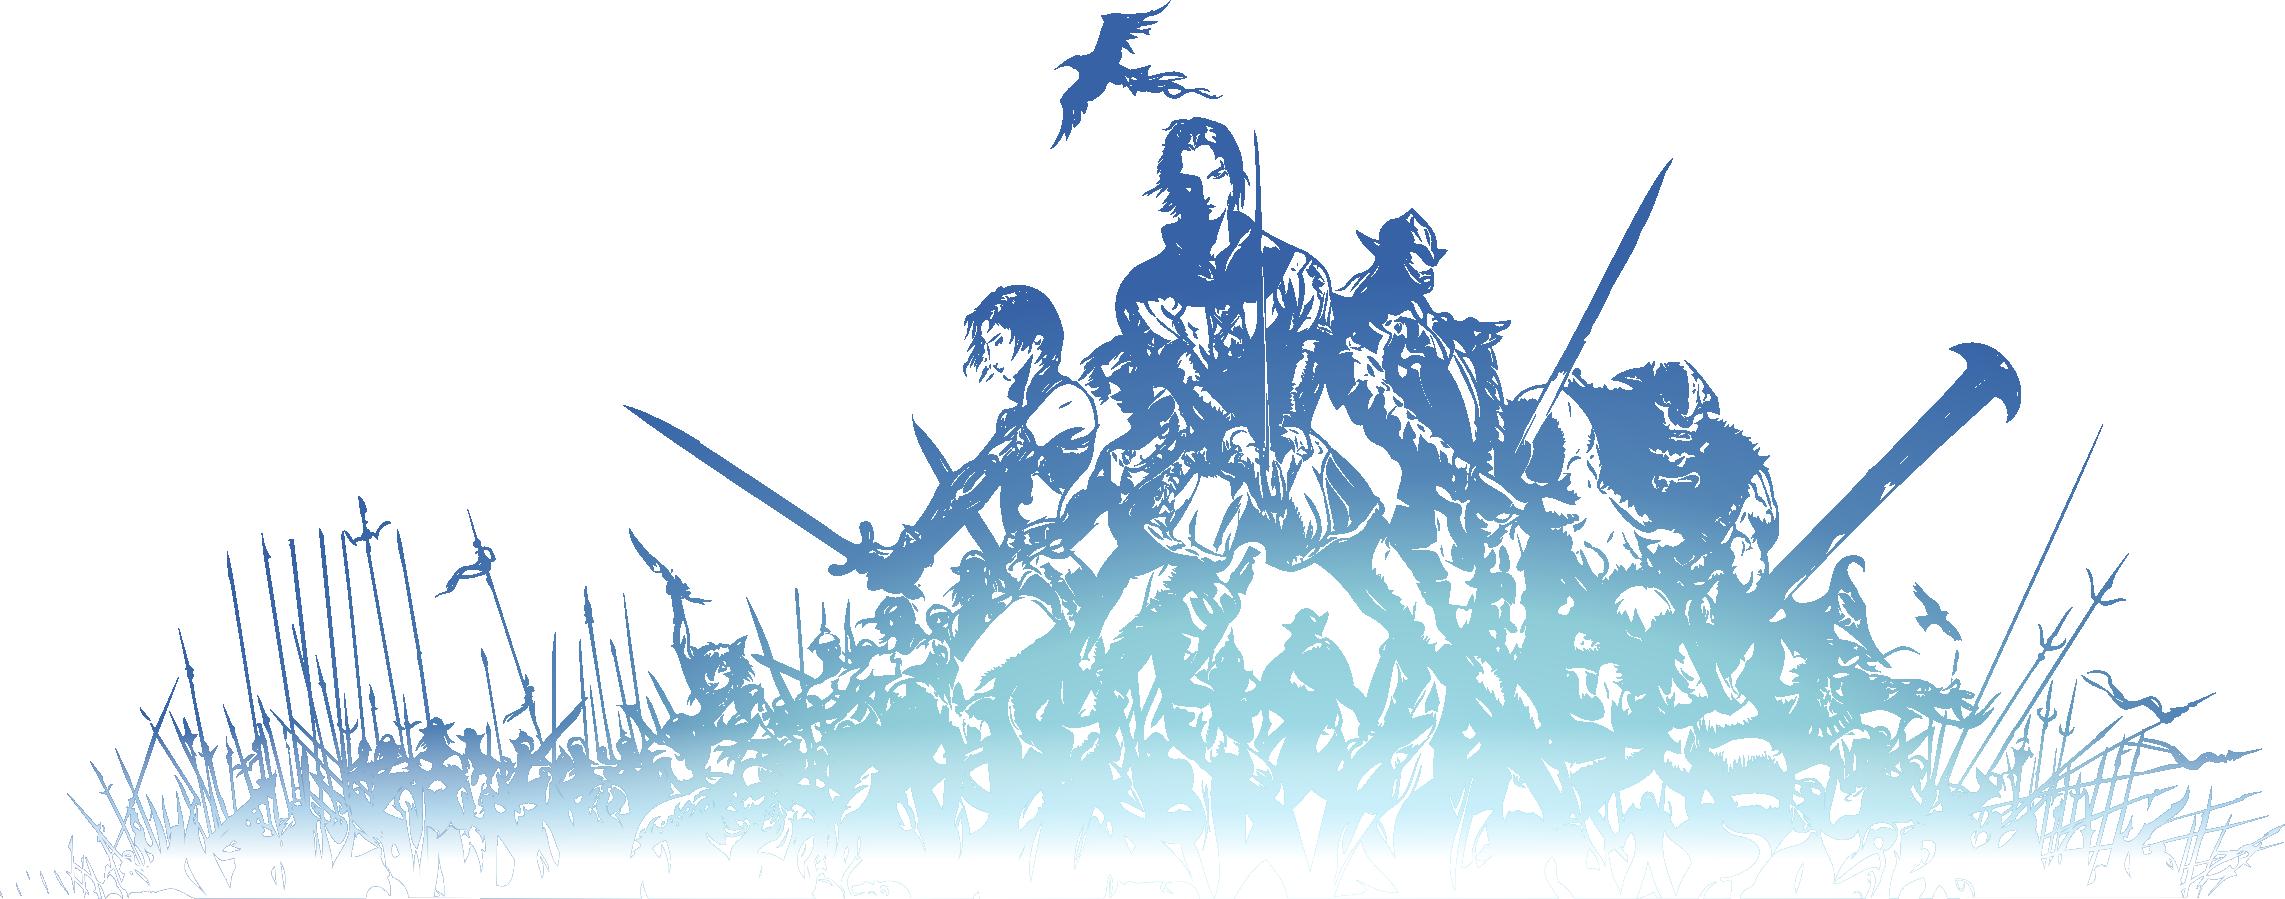 Final Fantasy XI logo by eldi13 on deviantART